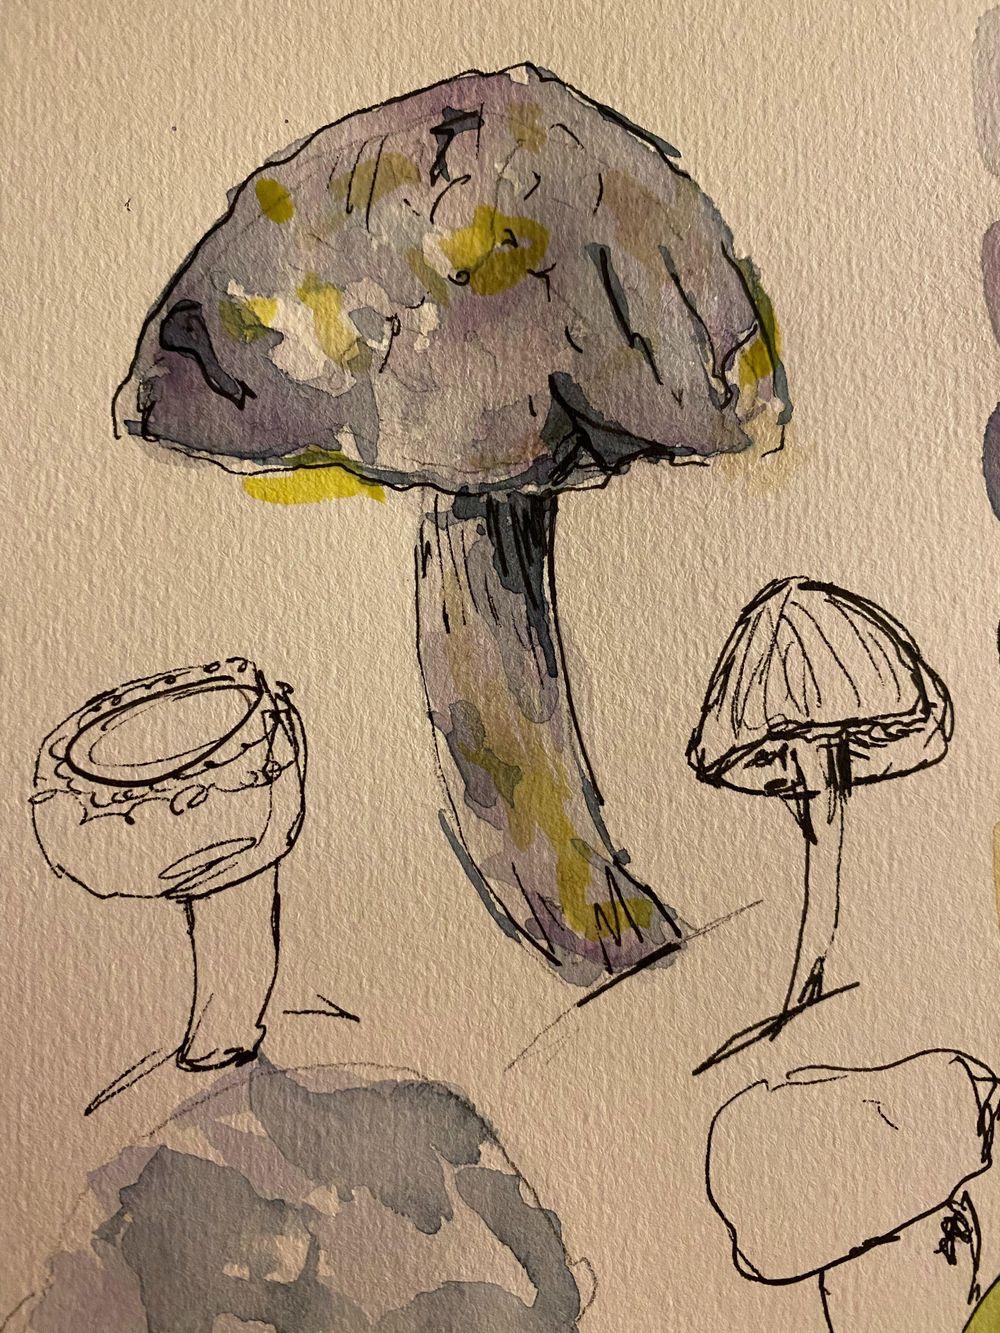 mushrooms! - image 2 - student project